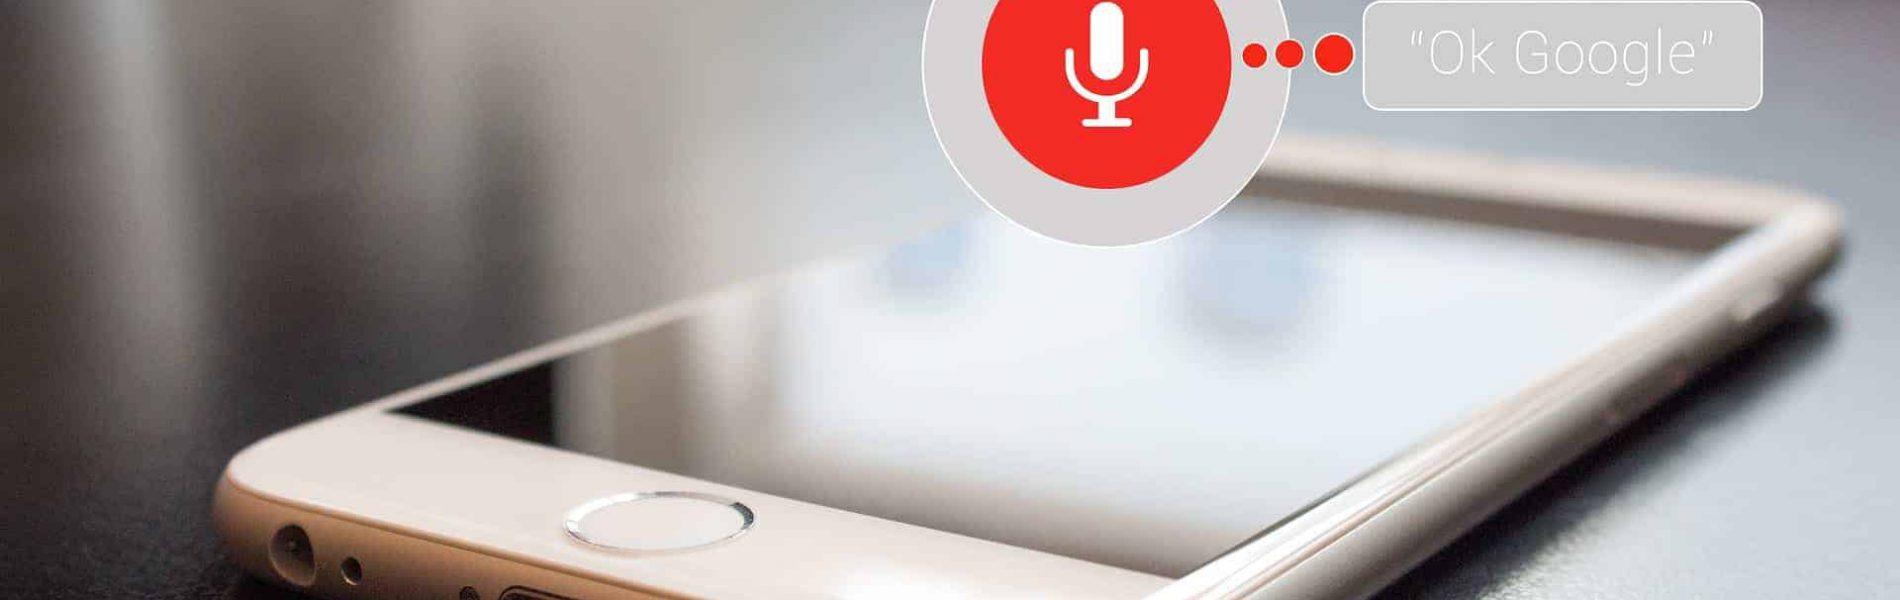 voice-control-2598422_1920 (1)